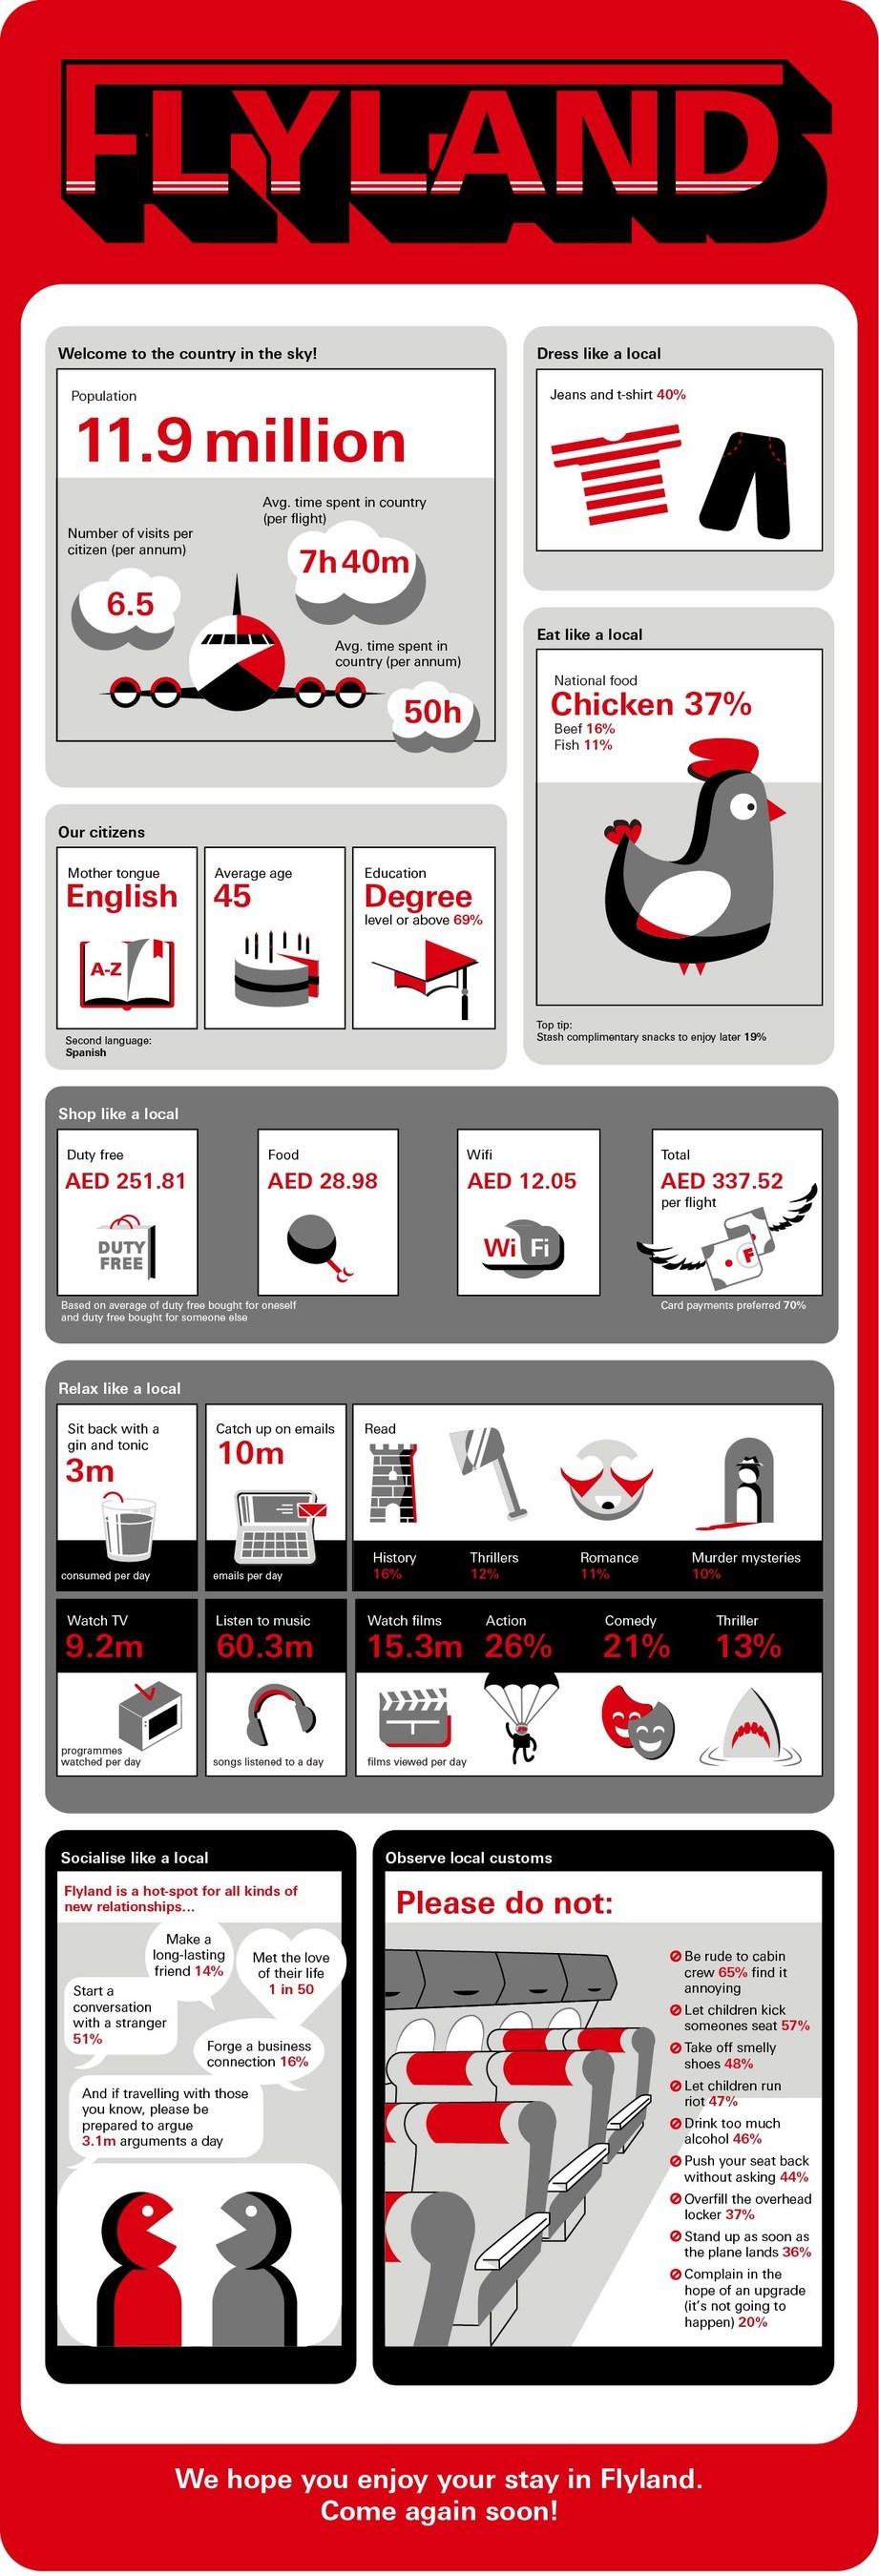 HSBC Flyland Infographic (PRNewsfoto/HSBC)